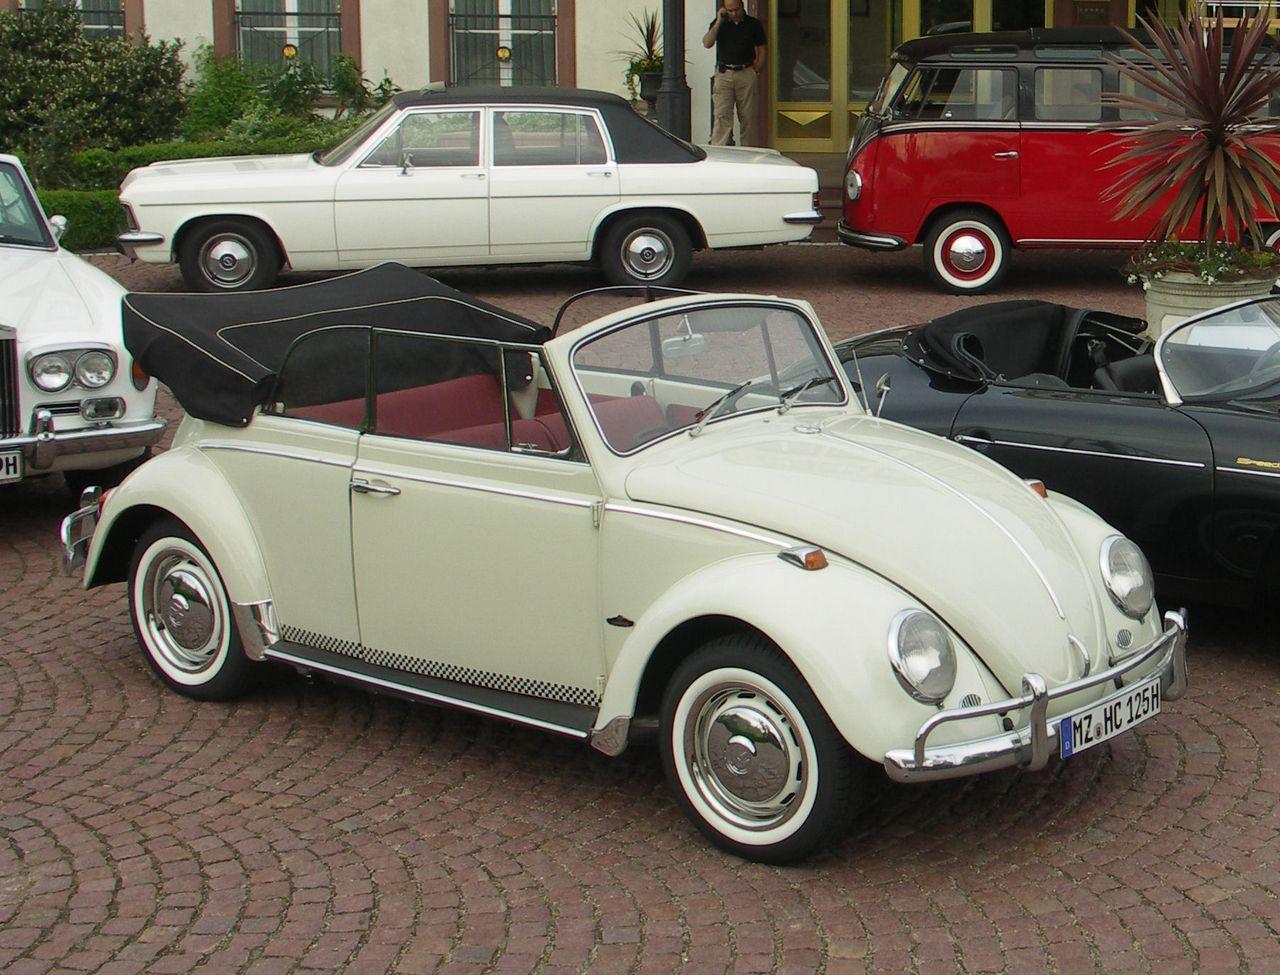 hollywood cars vw k fer cabriolet mieten mainz frankfurt wiesbaden darmstadt bad. Black Bedroom Furniture Sets. Home Design Ideas